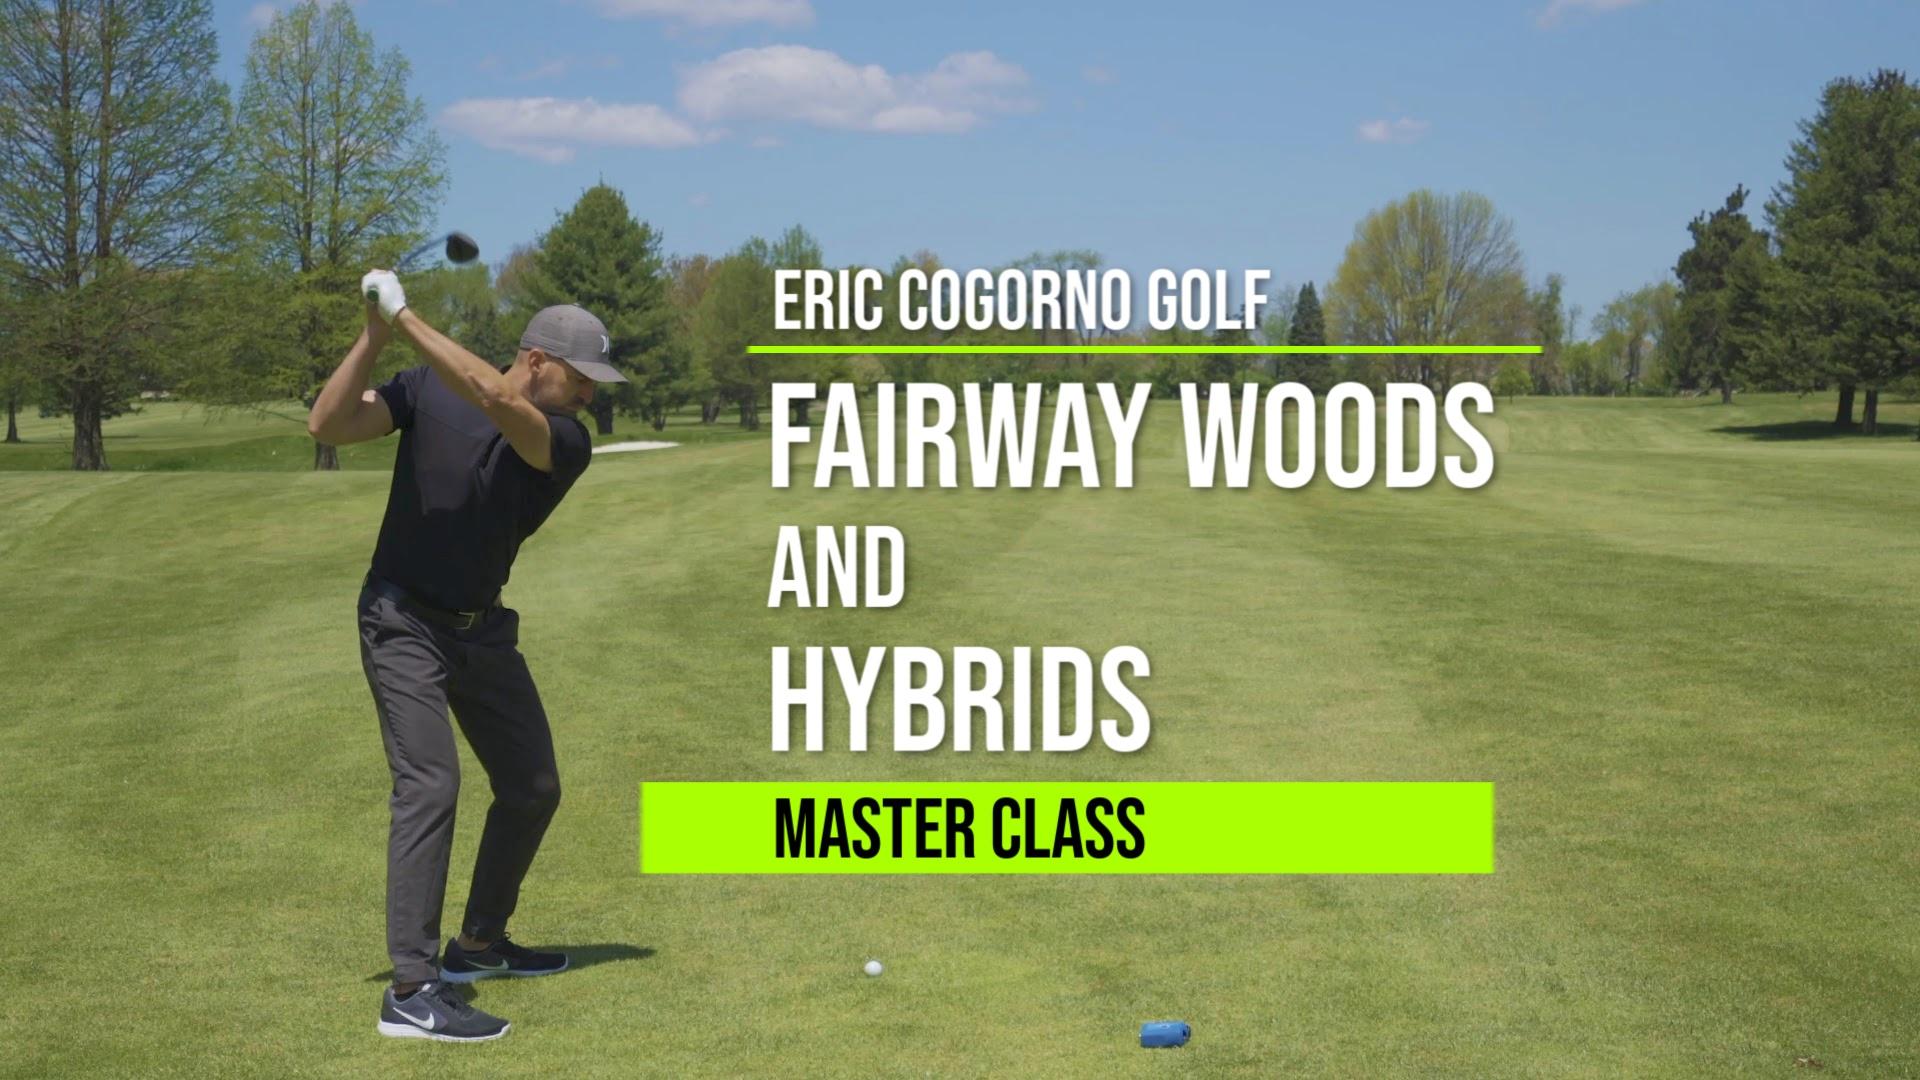 Fairway Woods & Hybrids Master Class